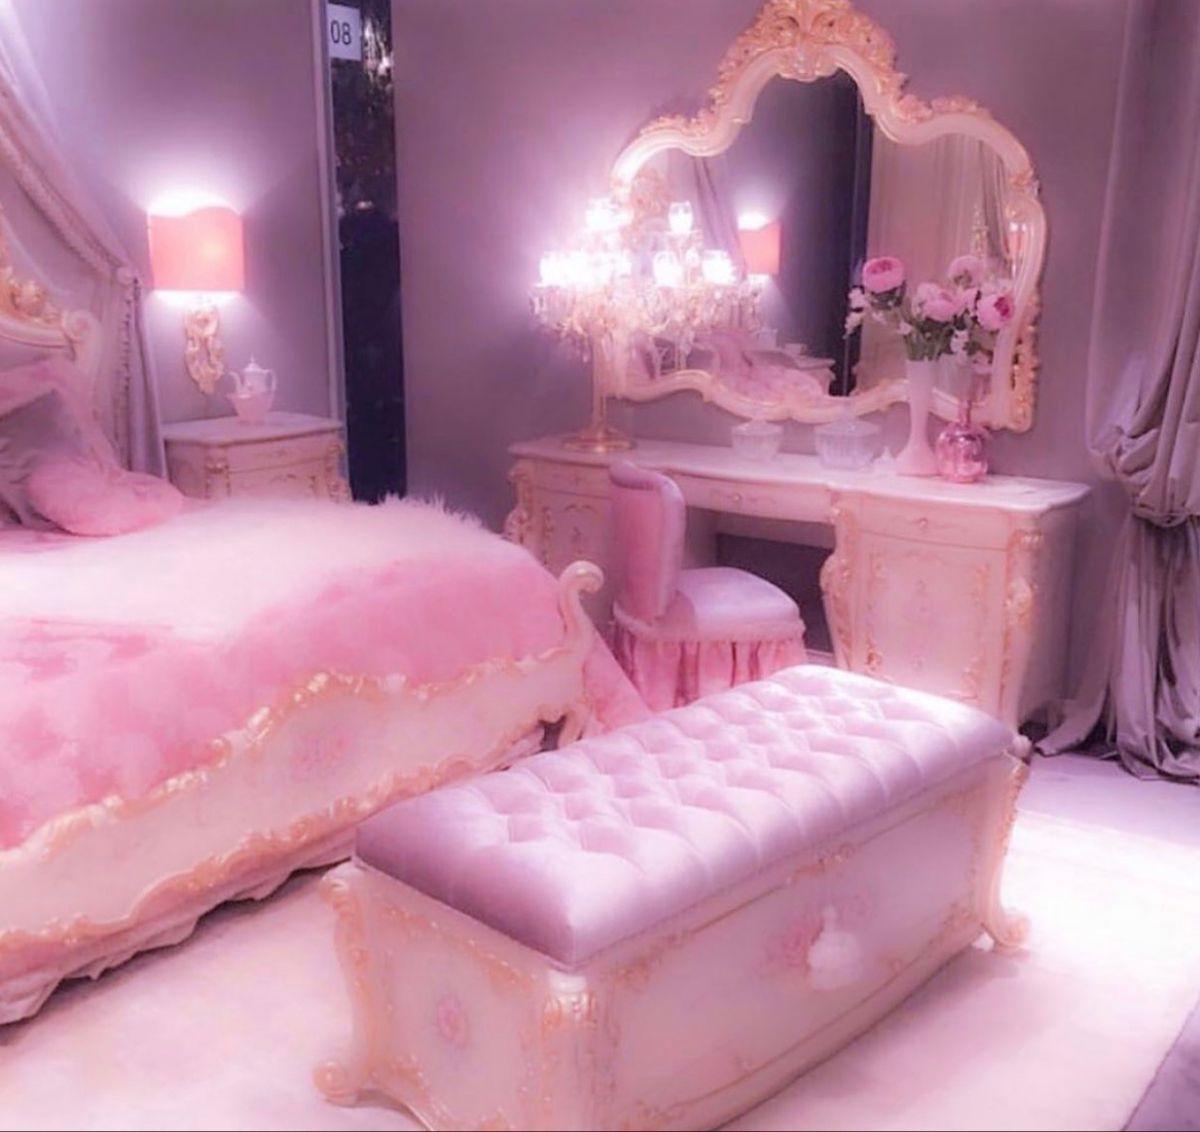 Baby Pink Princess Room In 2020 Pink Princess Room Pink Room Pink Walls